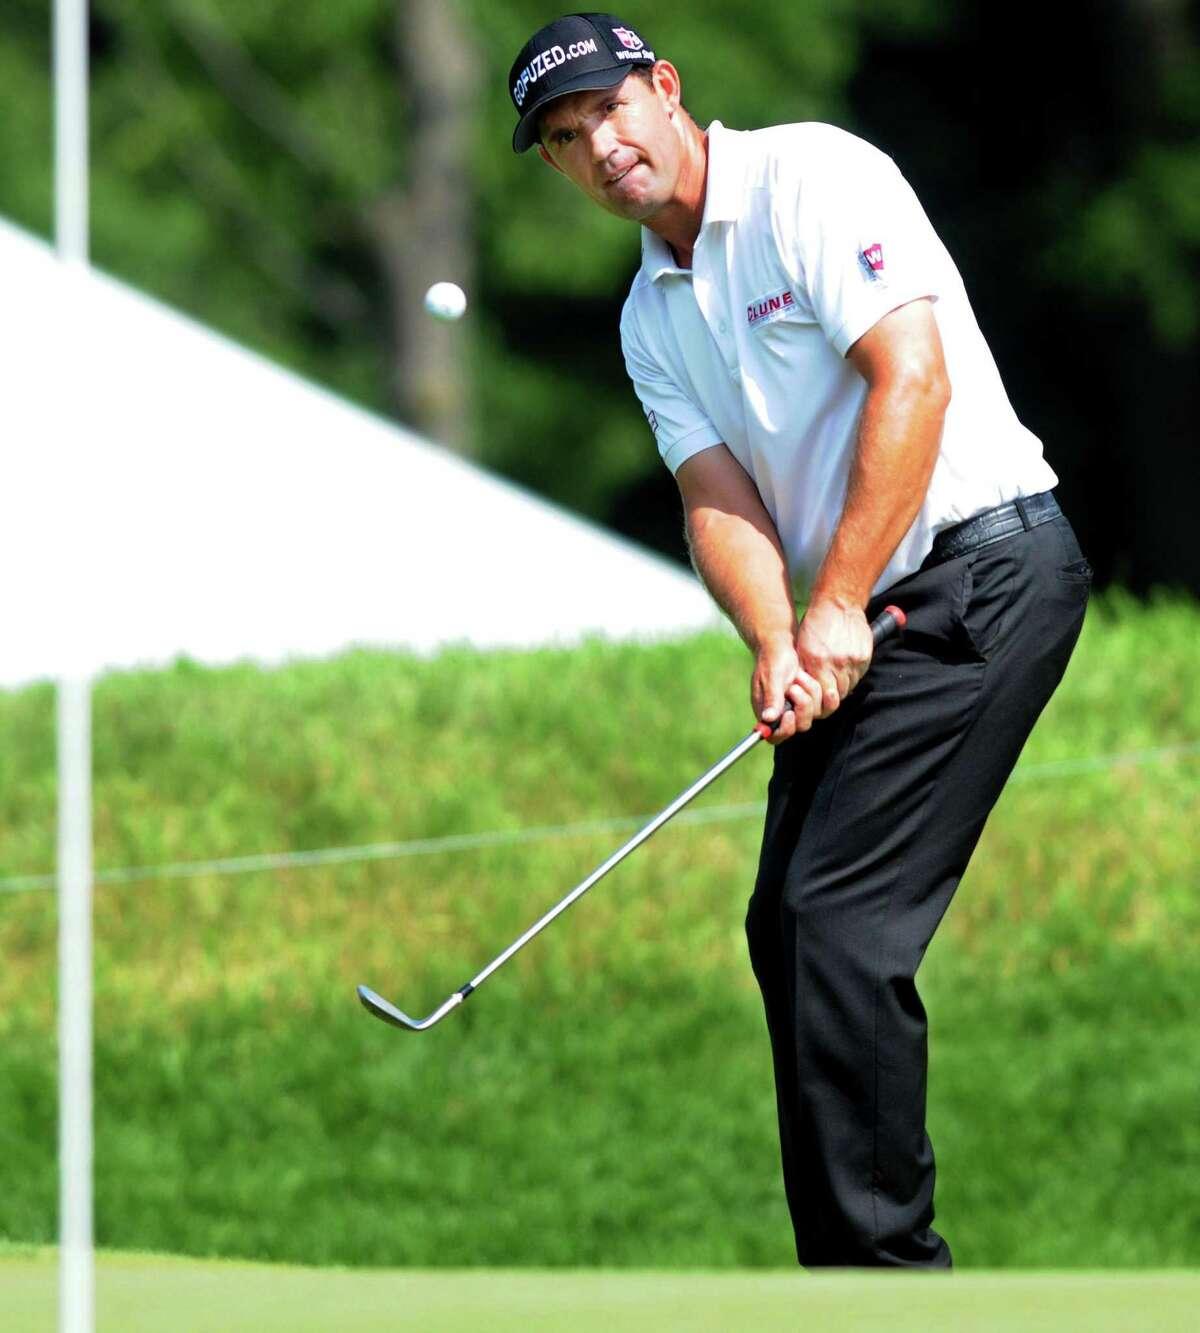 Mara Lavitt Ñ Register June 21, 2013: Travelers Championship golf at TPC River Highlands. Padraig Harrington. putting on 2.